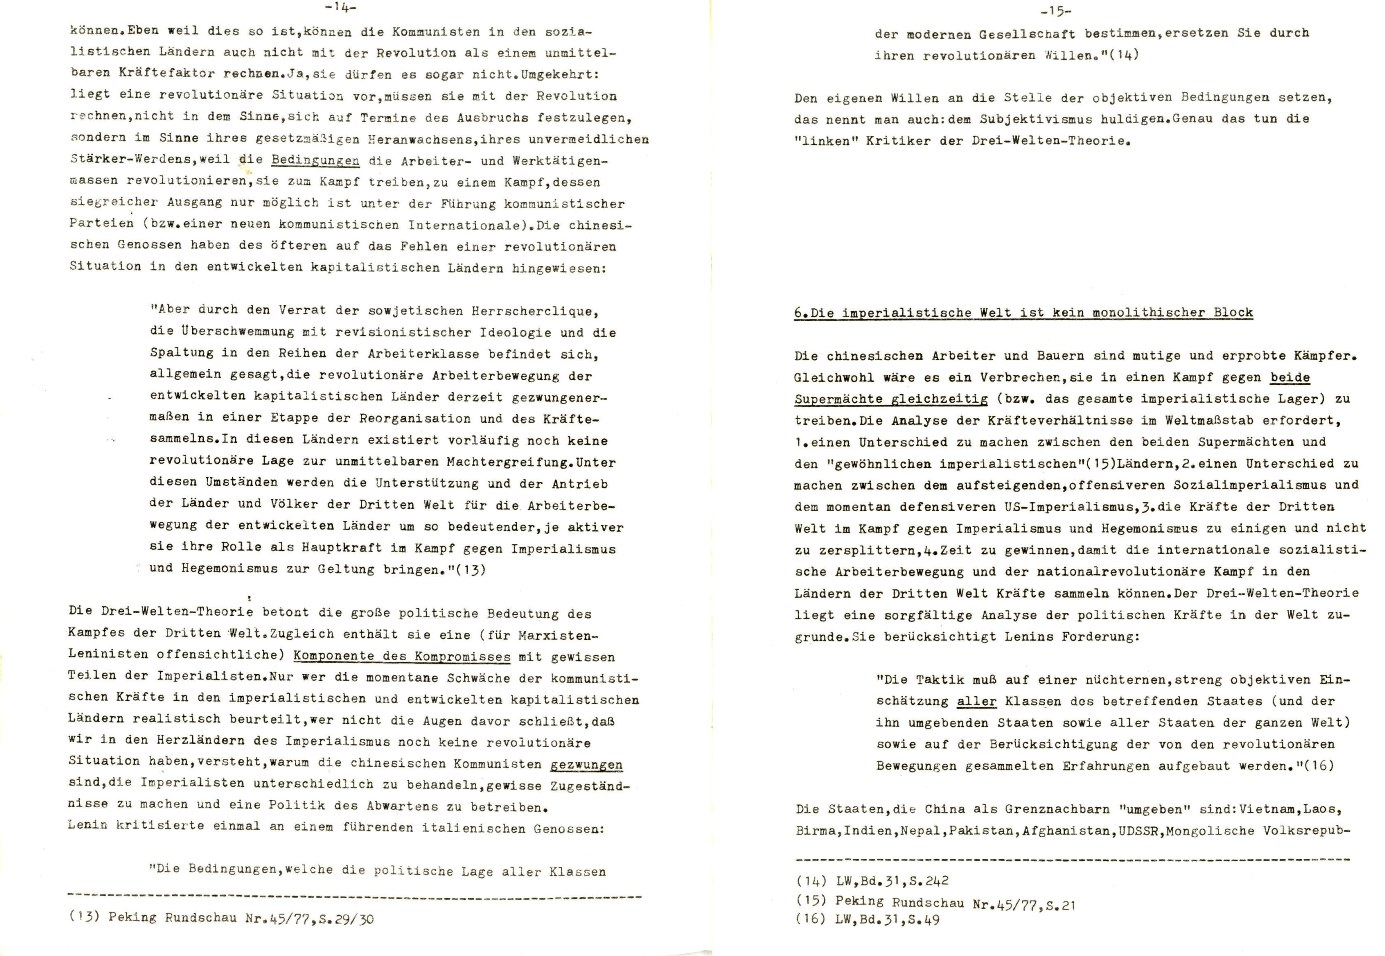 Muenchen_Kampf_dem_Revisionismus_1978_04_05_09